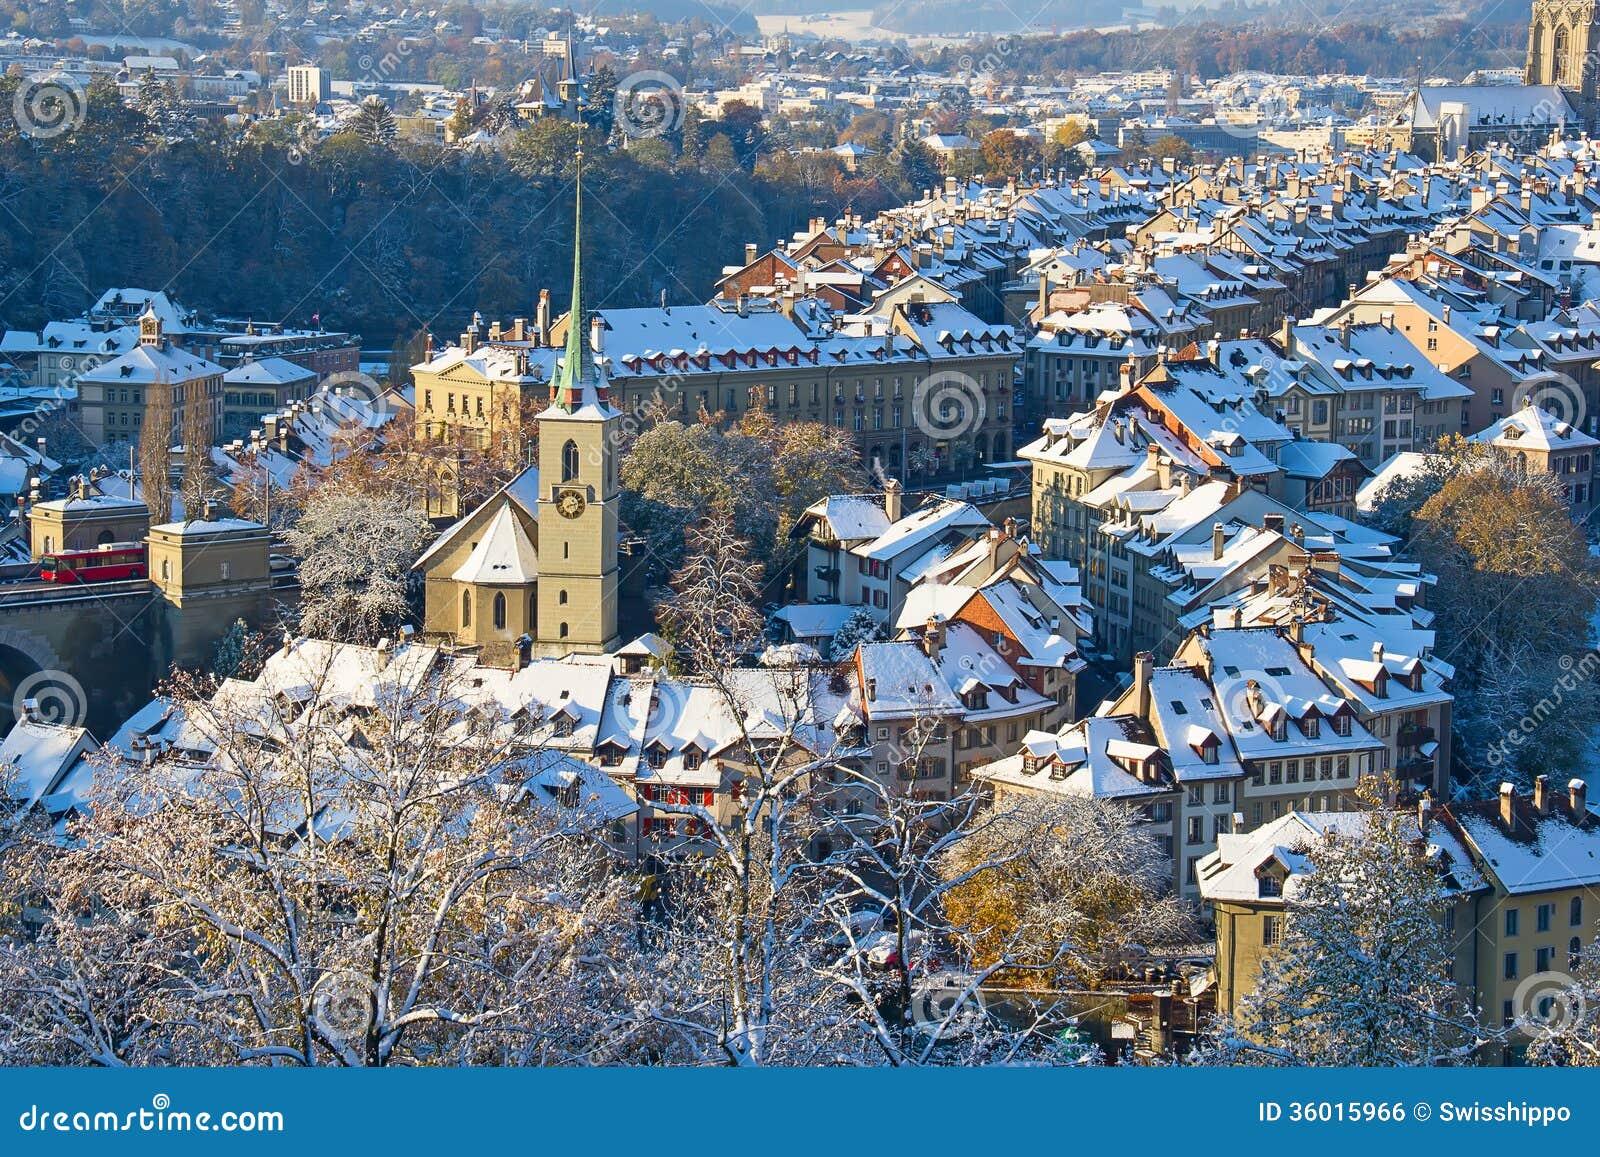 Bern In Winter Royalty Free Stock Image Image 36015966